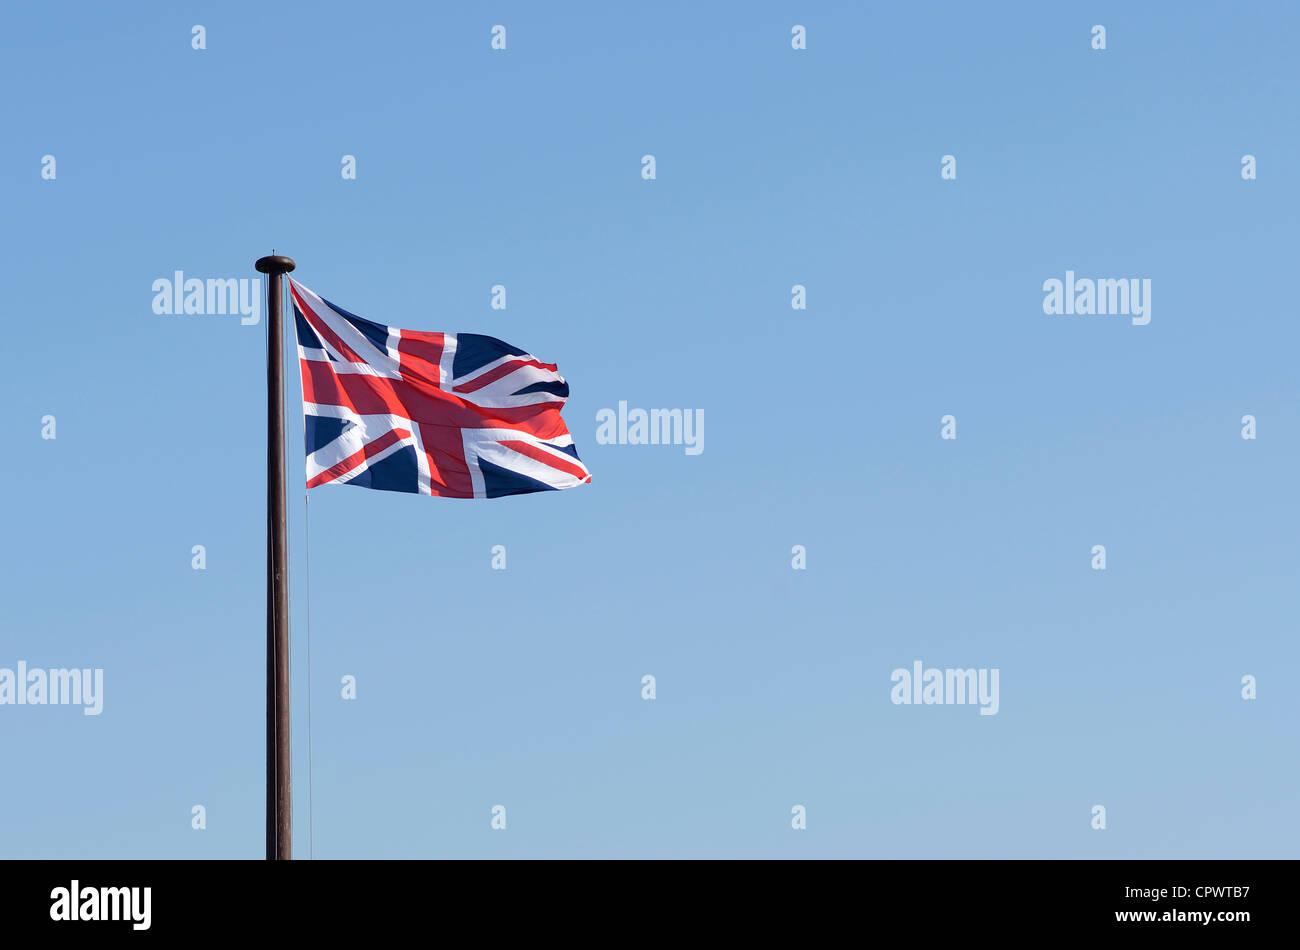 Union Jack flag flying against a blue sky - Stock Image